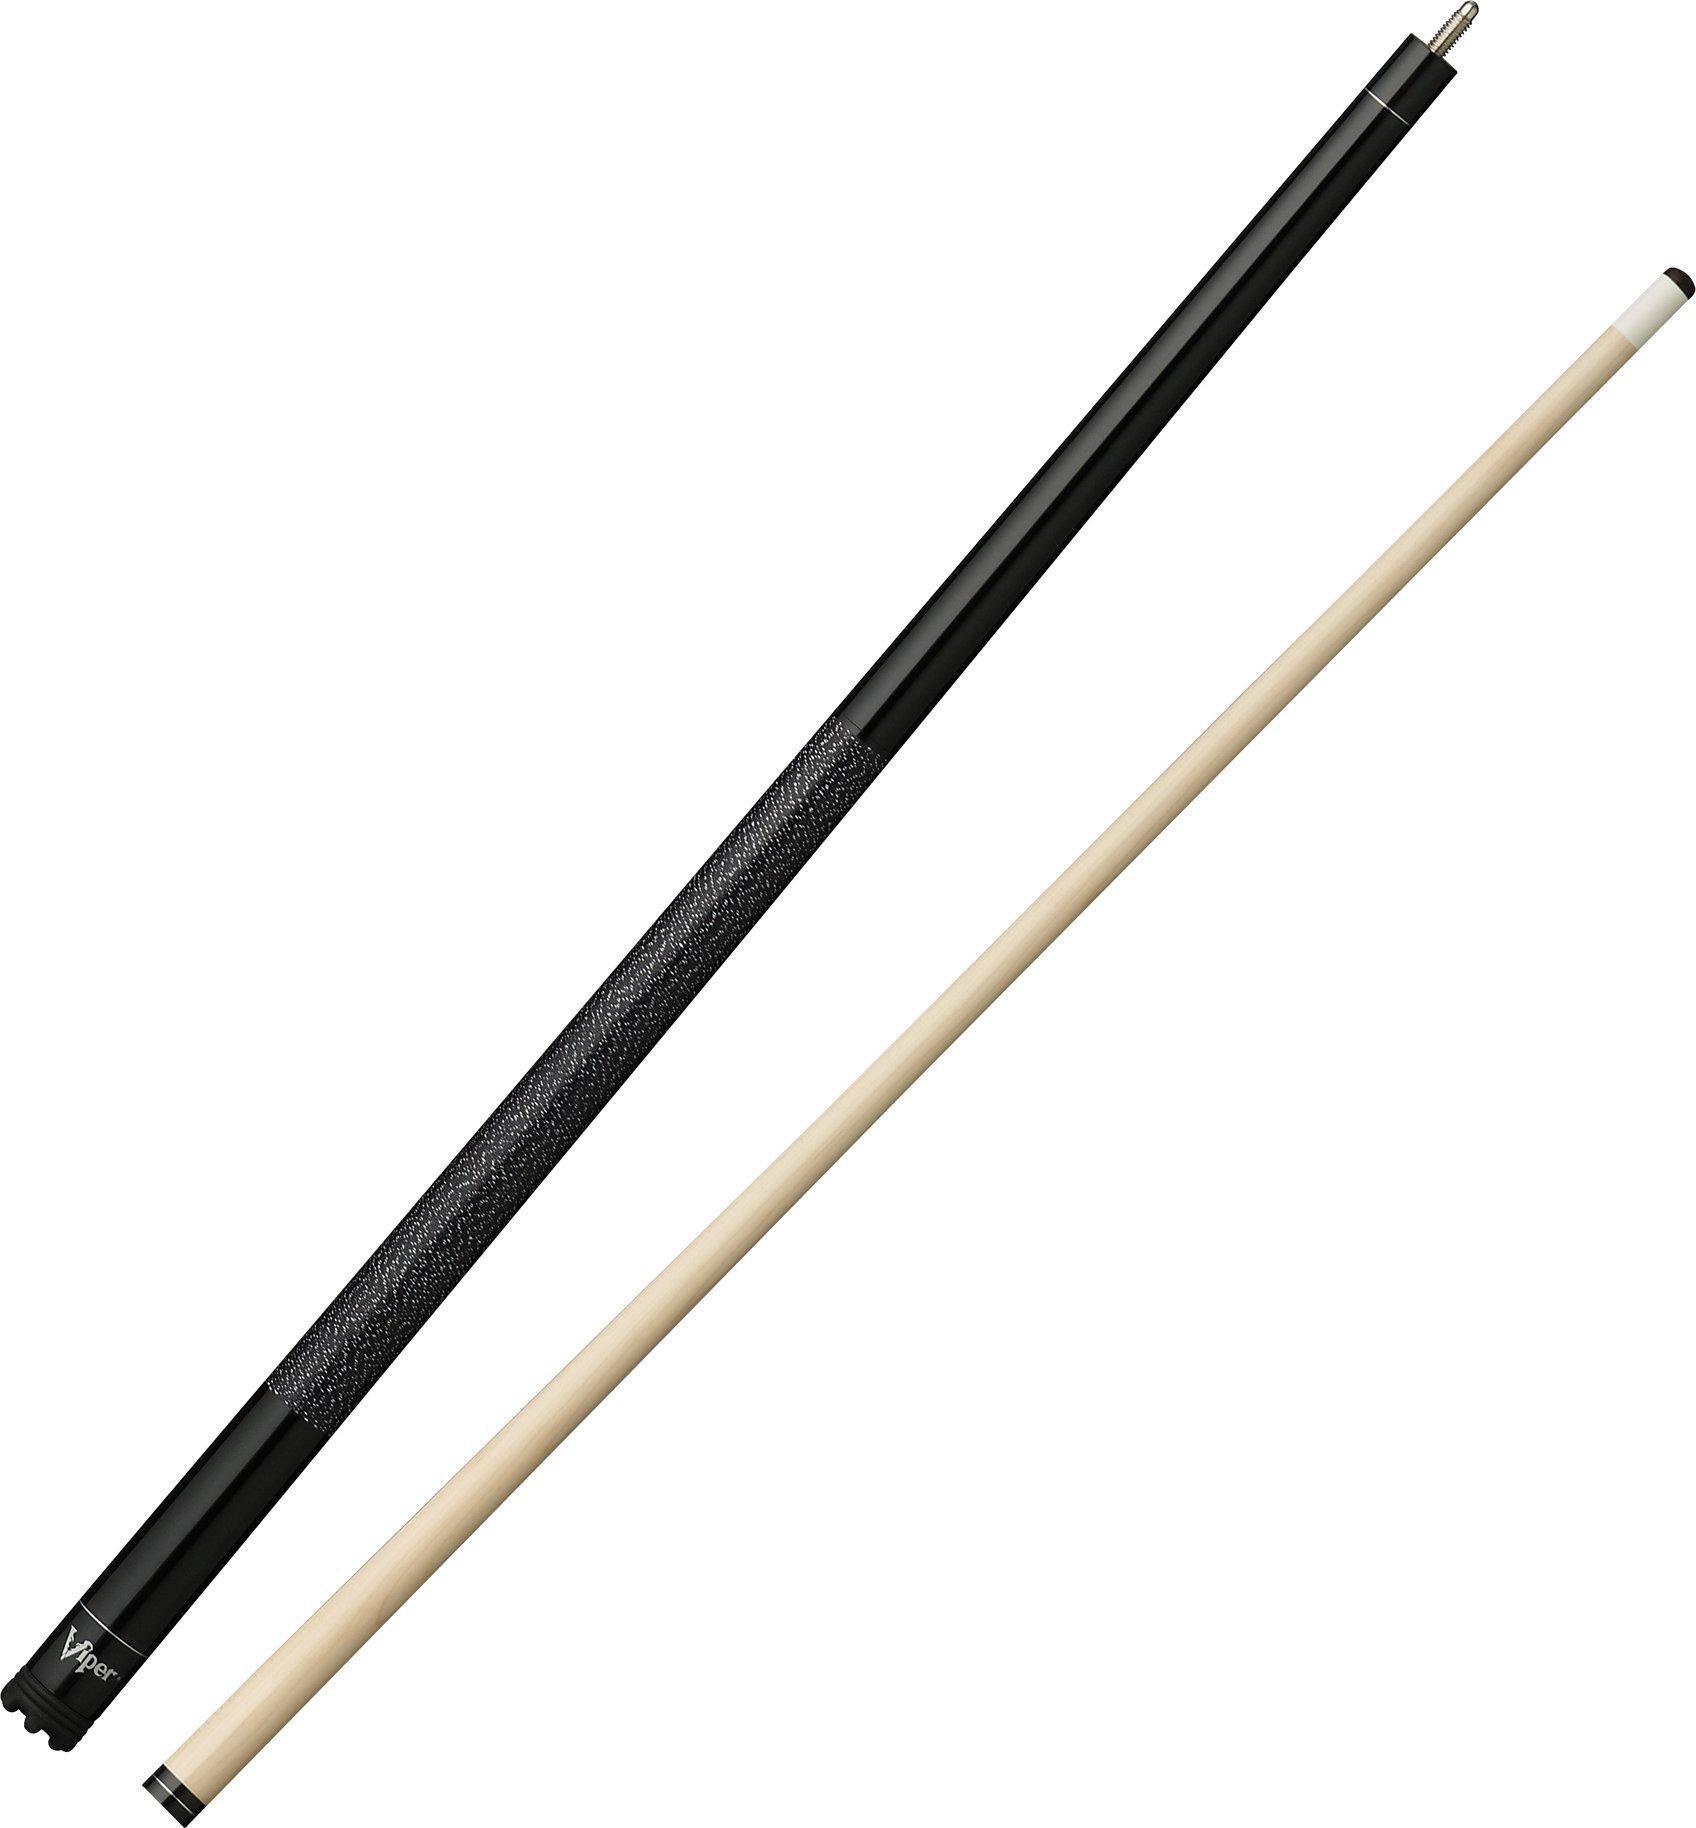 Viper Jump Shot/Break 58'' 3-Piece Billiard/Pool Cue, Black, 21 Ounce